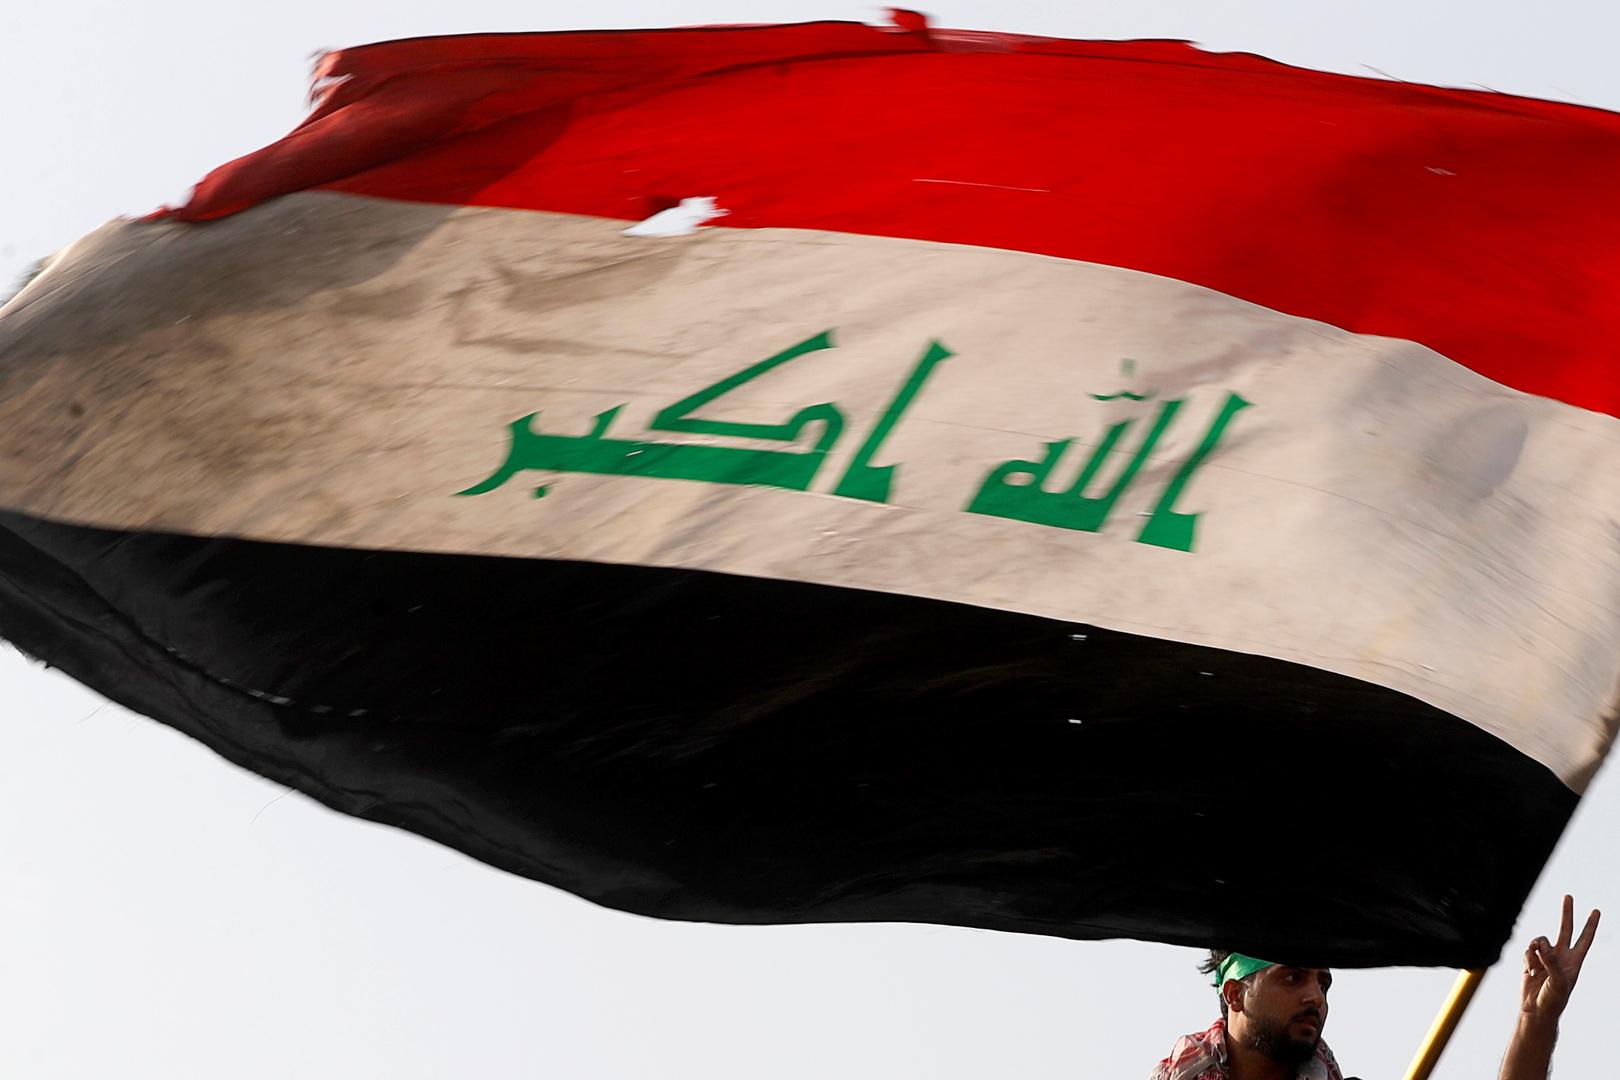 The Jordanian Prime Minister arrives in Baghdad on an official visit